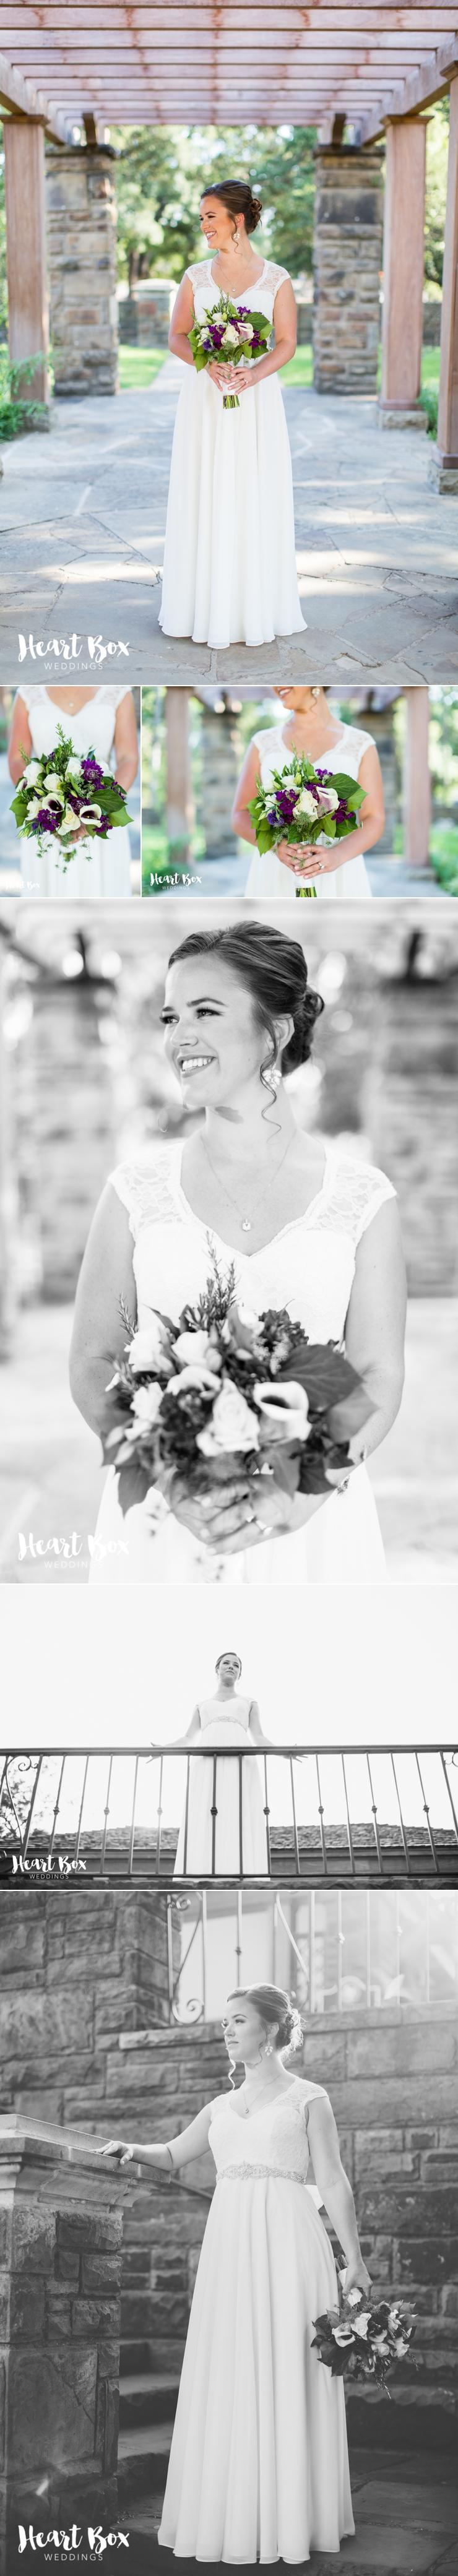 Hailey Bridal Blog Collages 1.jpg